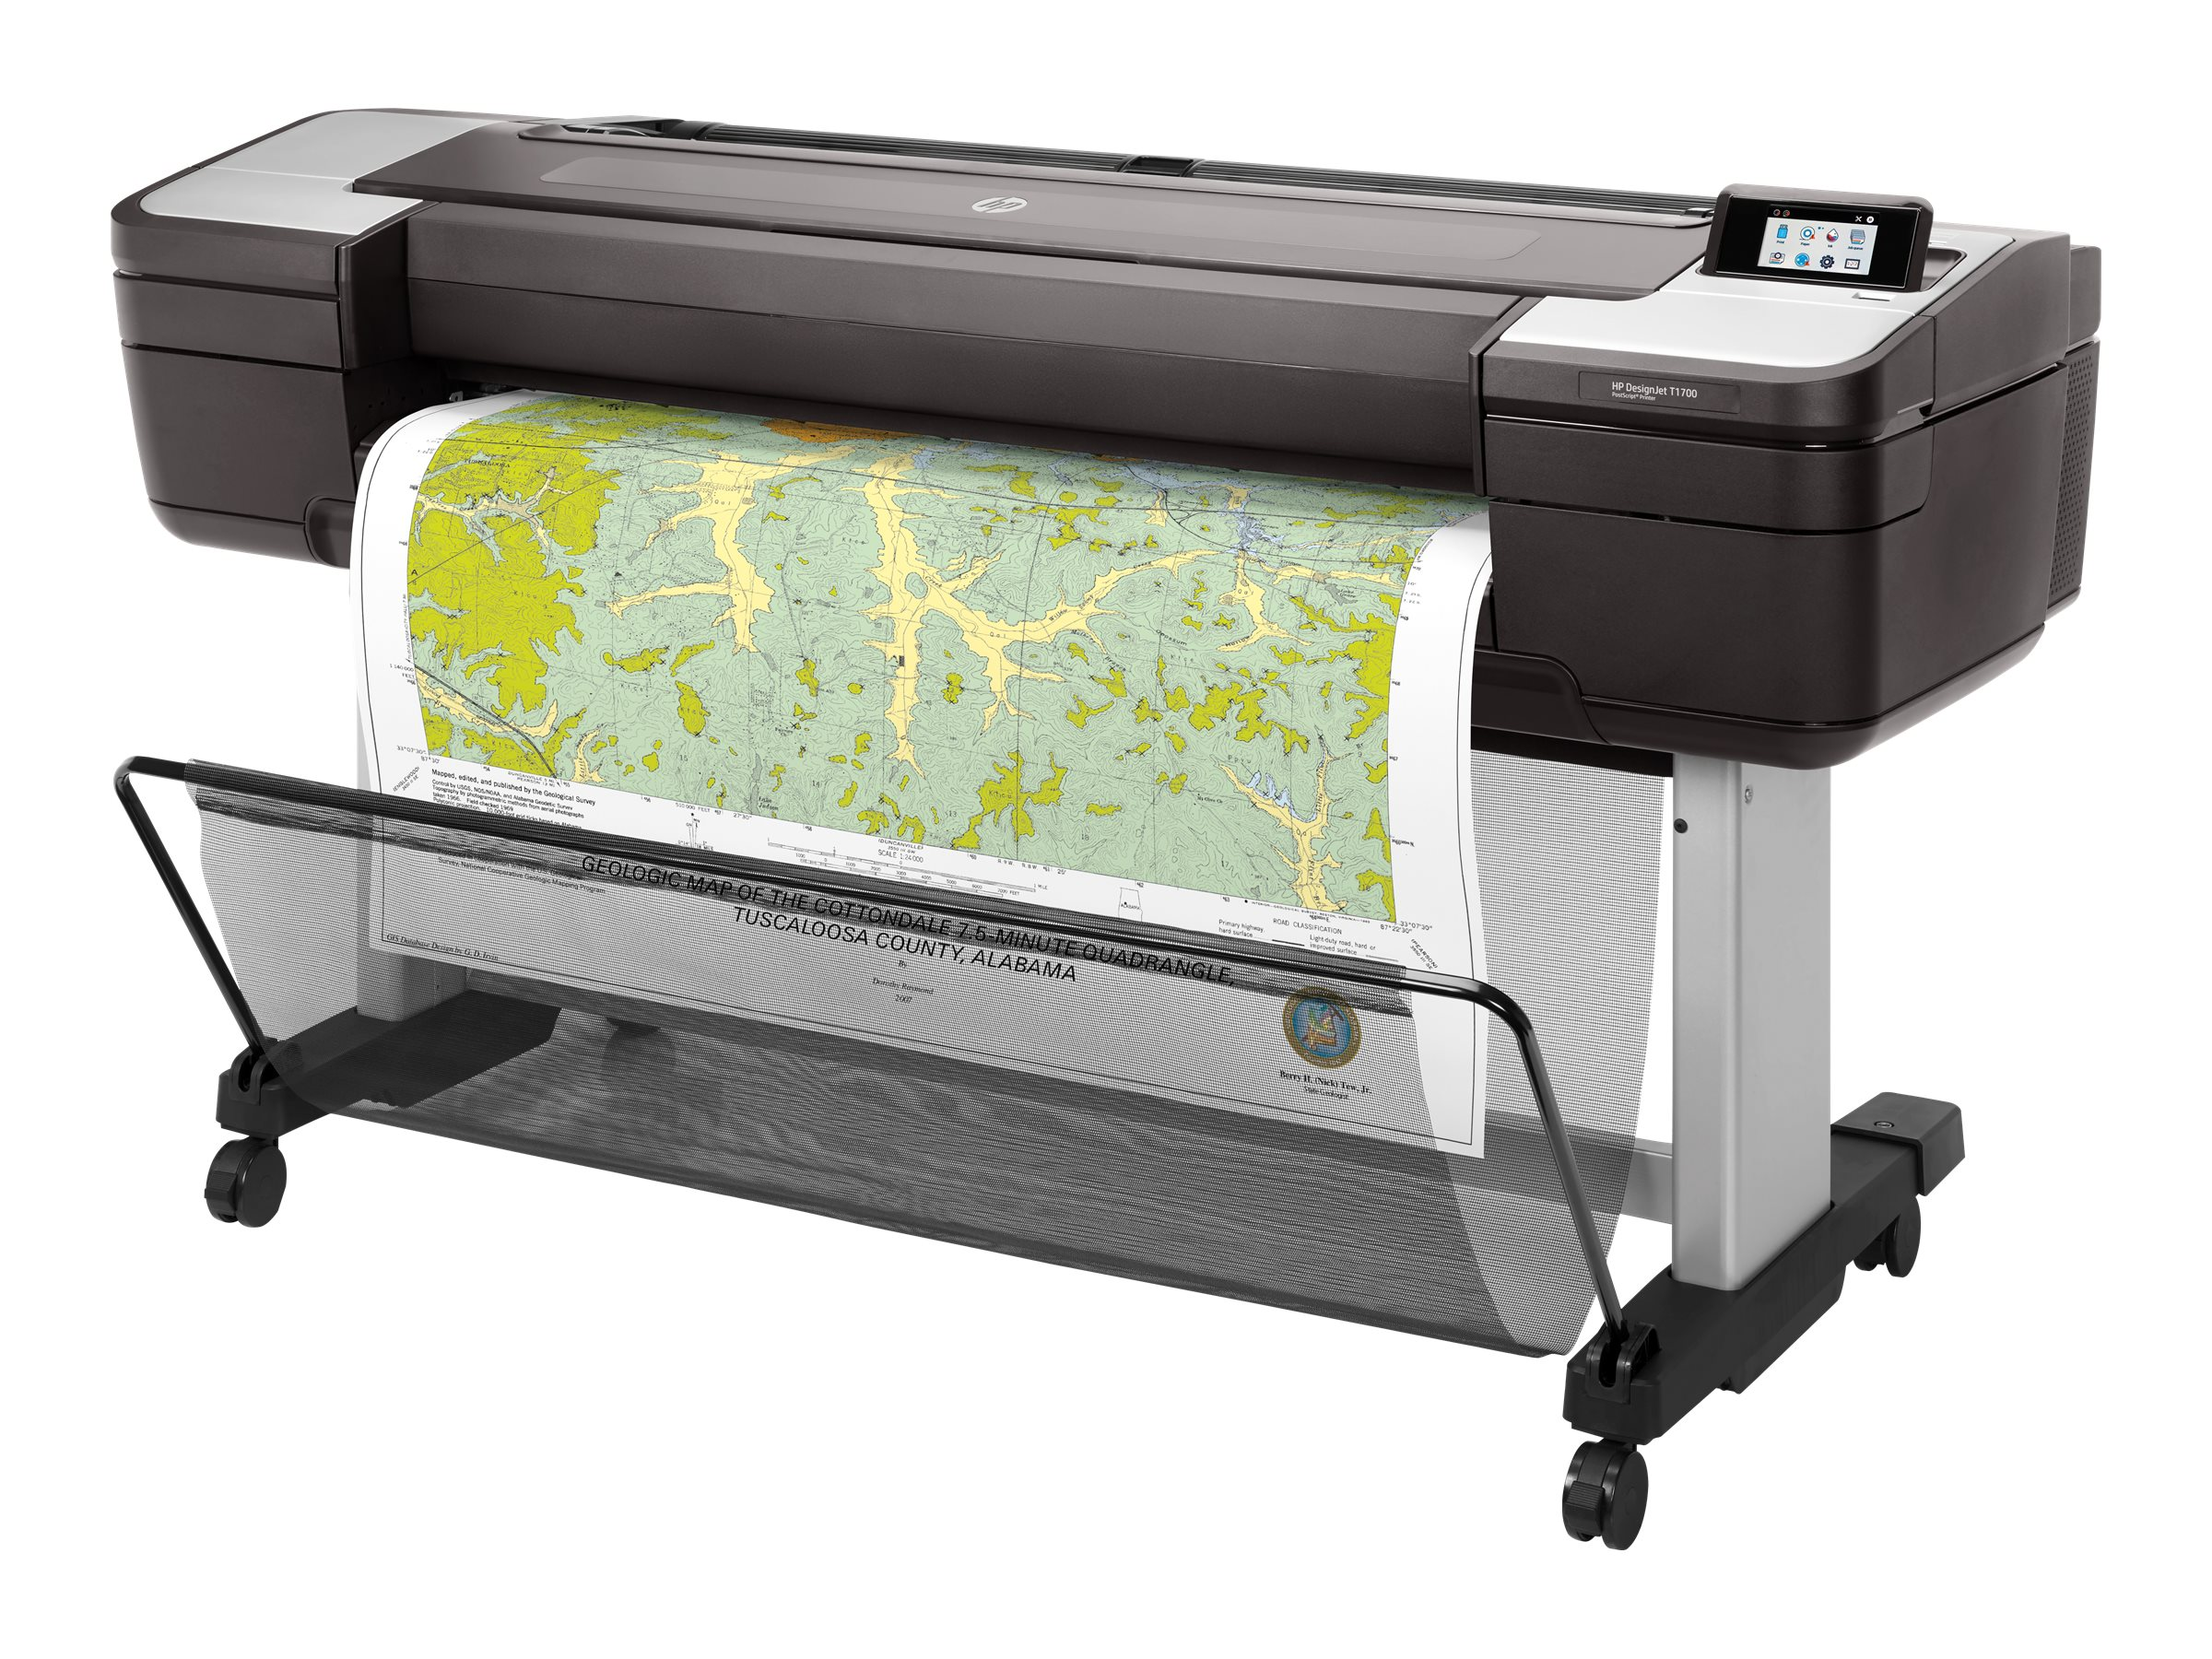 HP DesignJet T1700 PostScript - 1118 mm (44